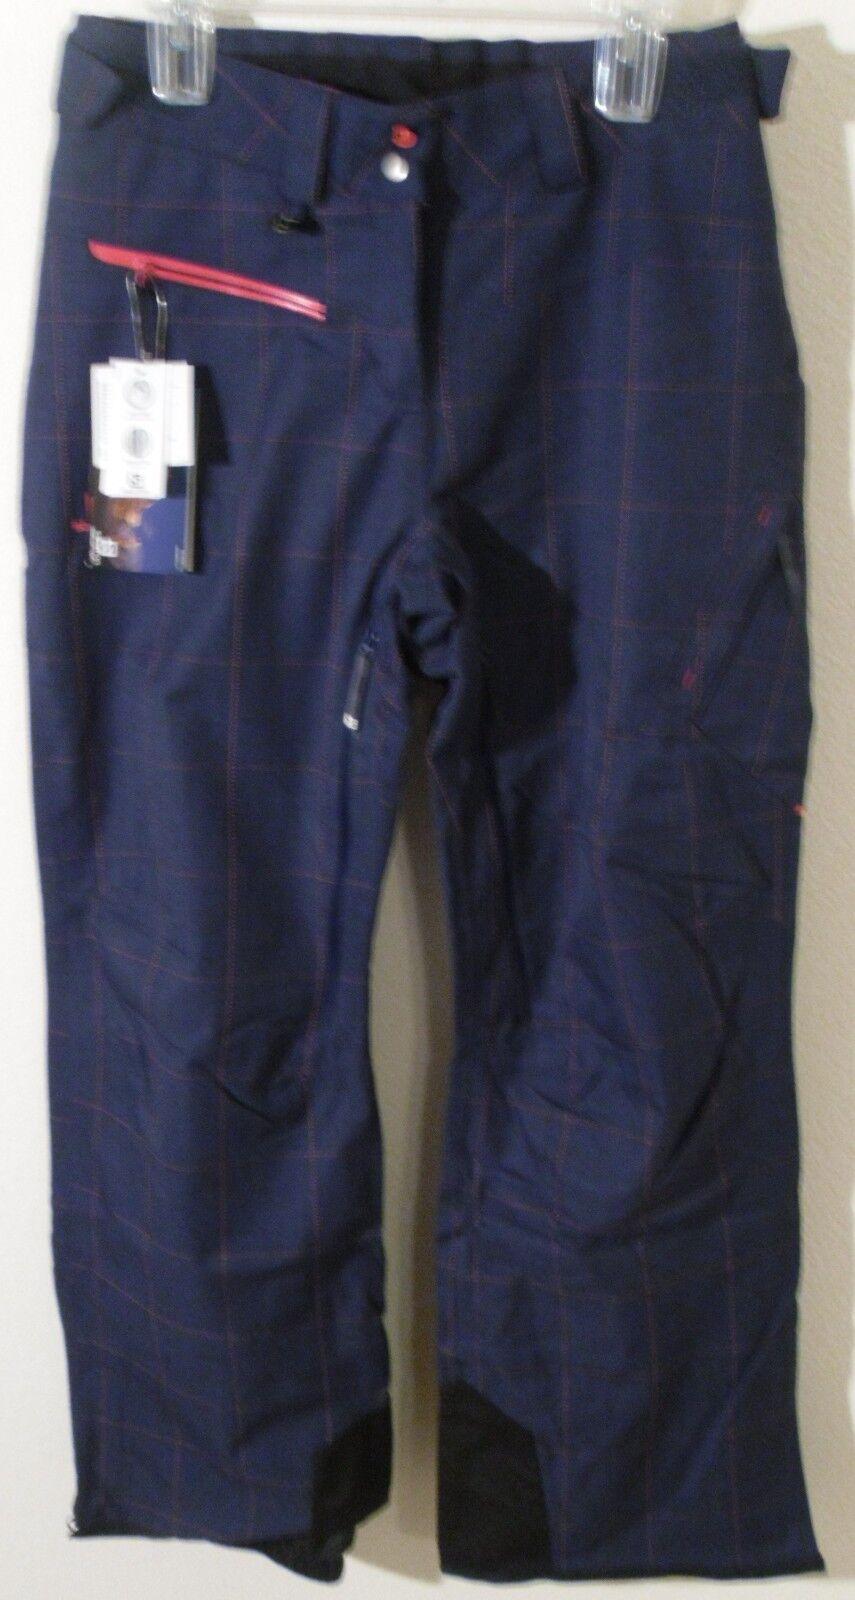 NWT Salomon Foresight Womens Snowboard Ski Pants XL Wizard purple MSRP